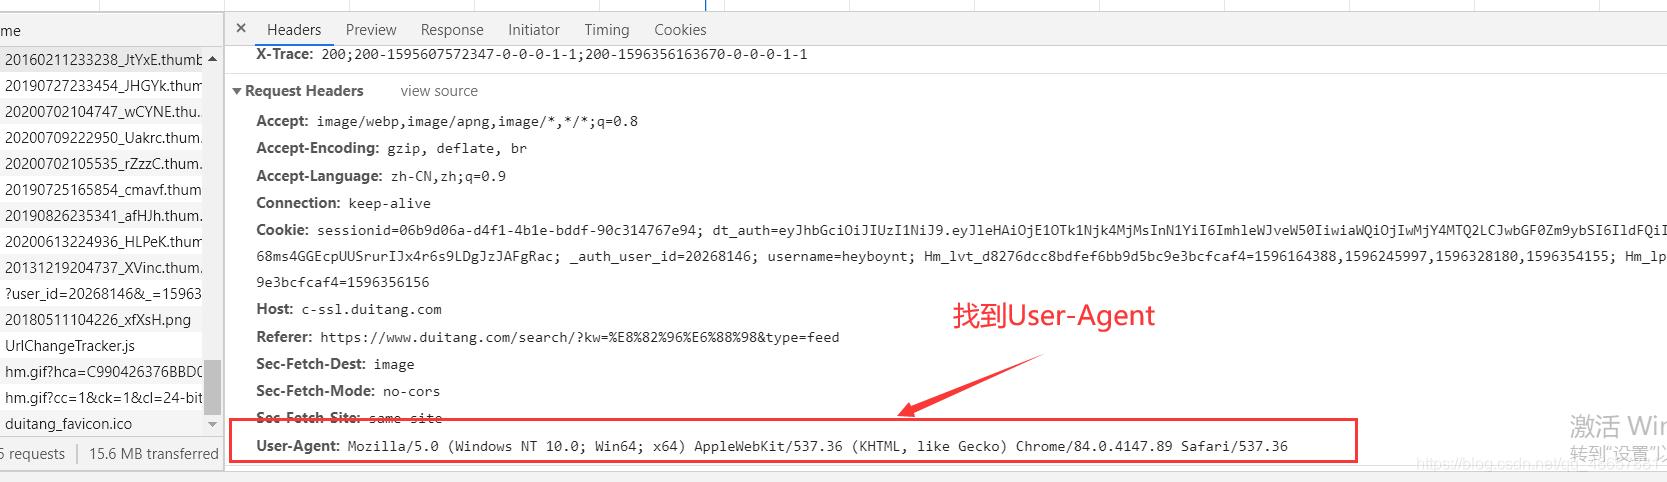 python爬取图片(根据用户需求输入想爬取的内容及页数)qq48657881的博客-.